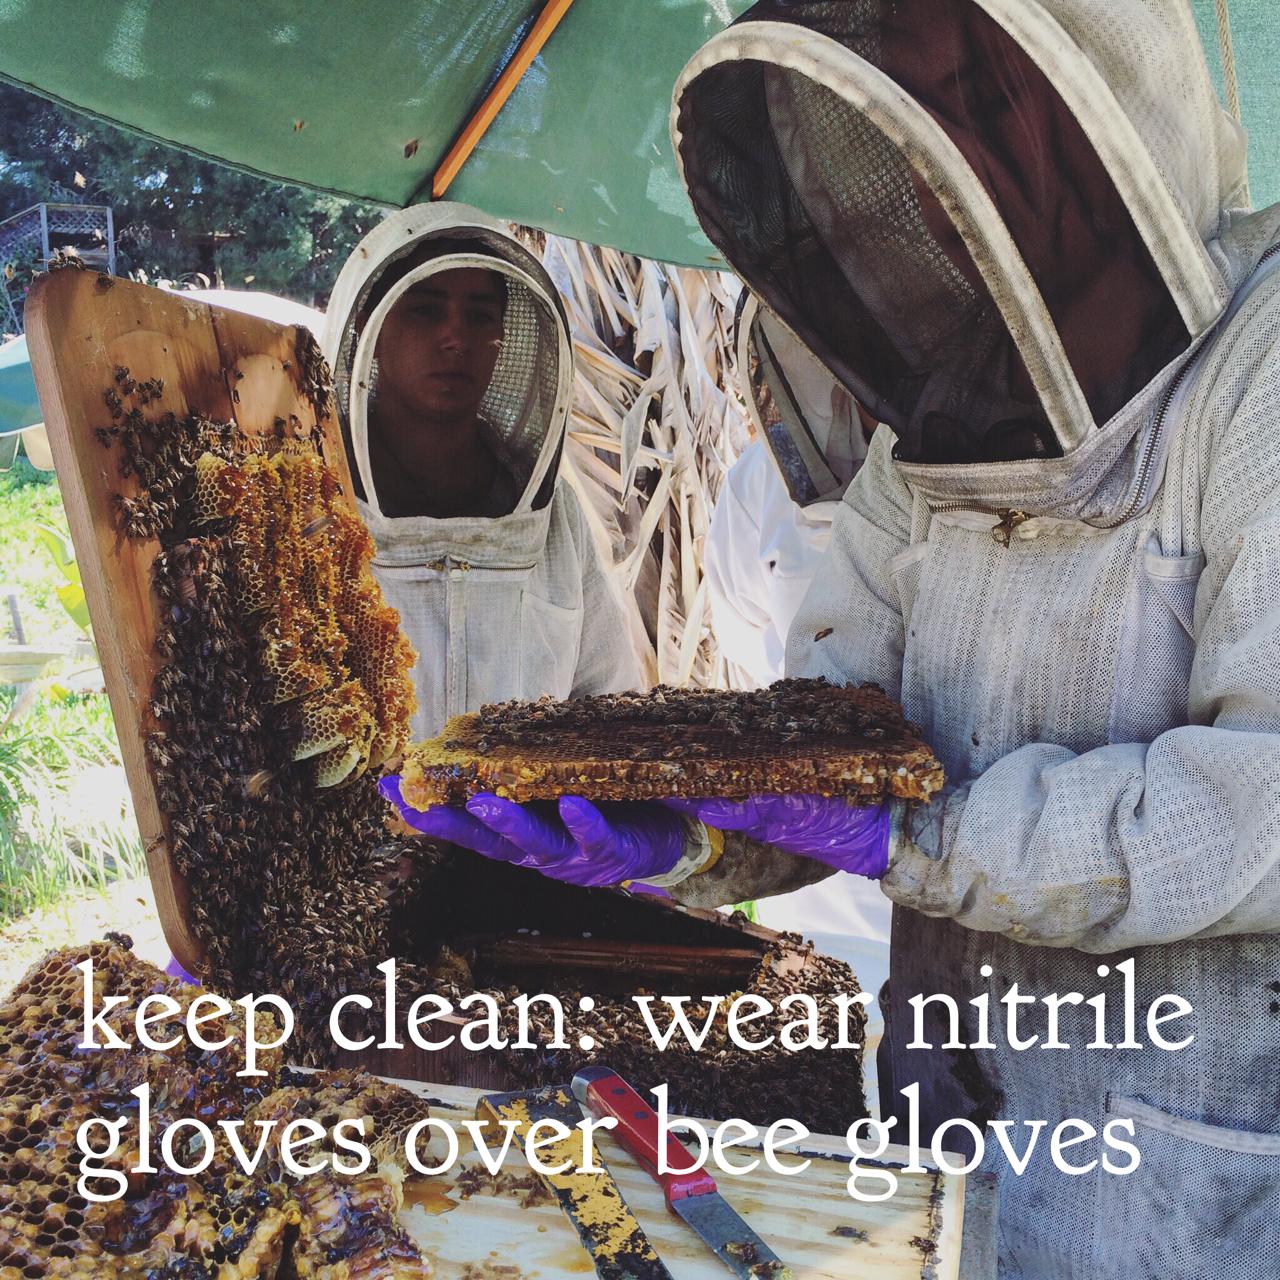 Beekeeping Lifehack: Use Nitrile Gloves to Keep Clean